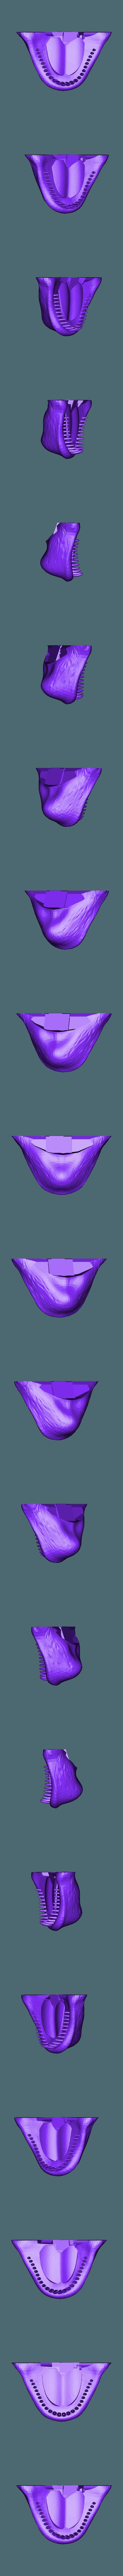 GADGETs head  pt7.stl Download free STL file GADGET the robotic Gremlin • 3D printing object, atarka3